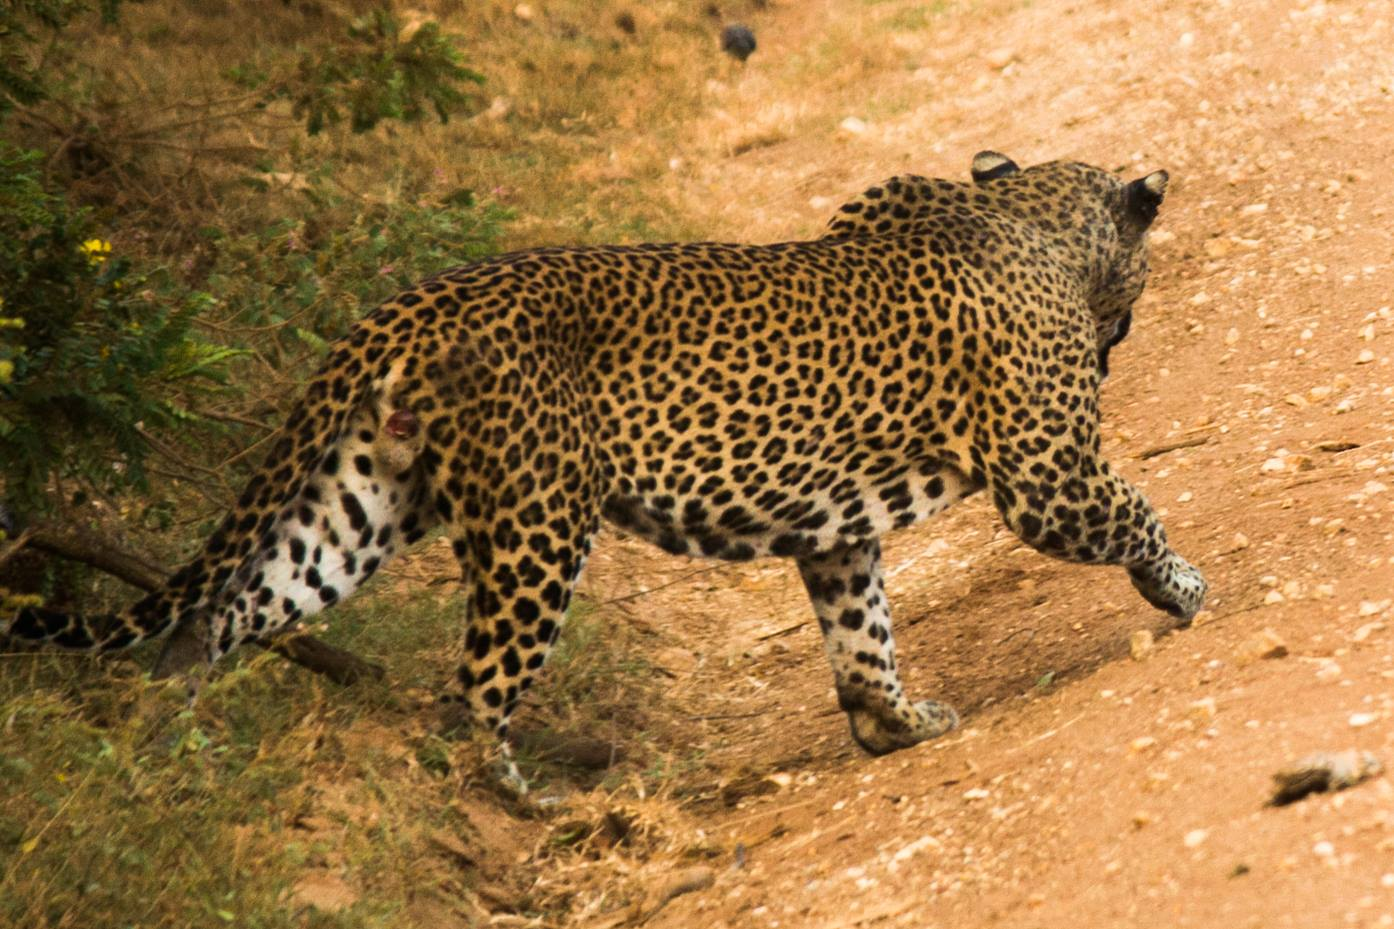 invite-to-paradise-sri-lanka-and-maldives-specialists-travel-agent-tour-operator-customer-review-feedback-joel-rhian-wildlife-leopard-safari-yala.jpg